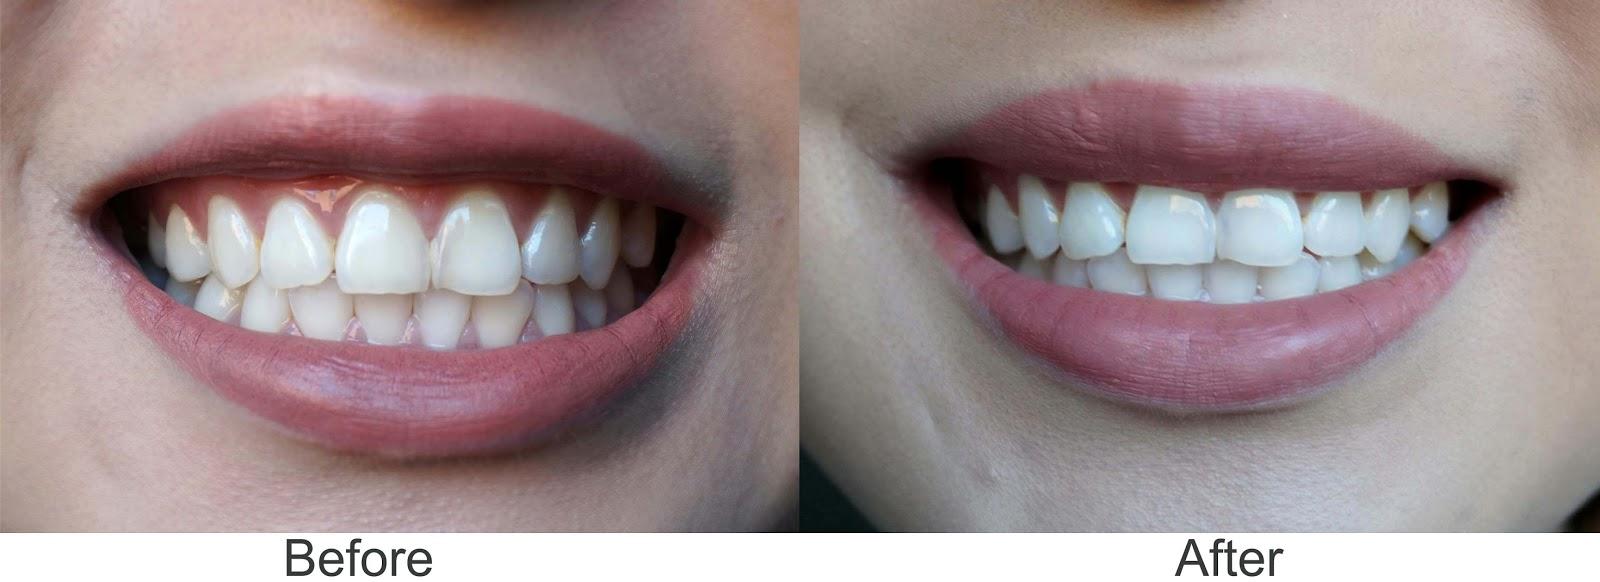 Joyce Lau My Teeth Whitening Routine